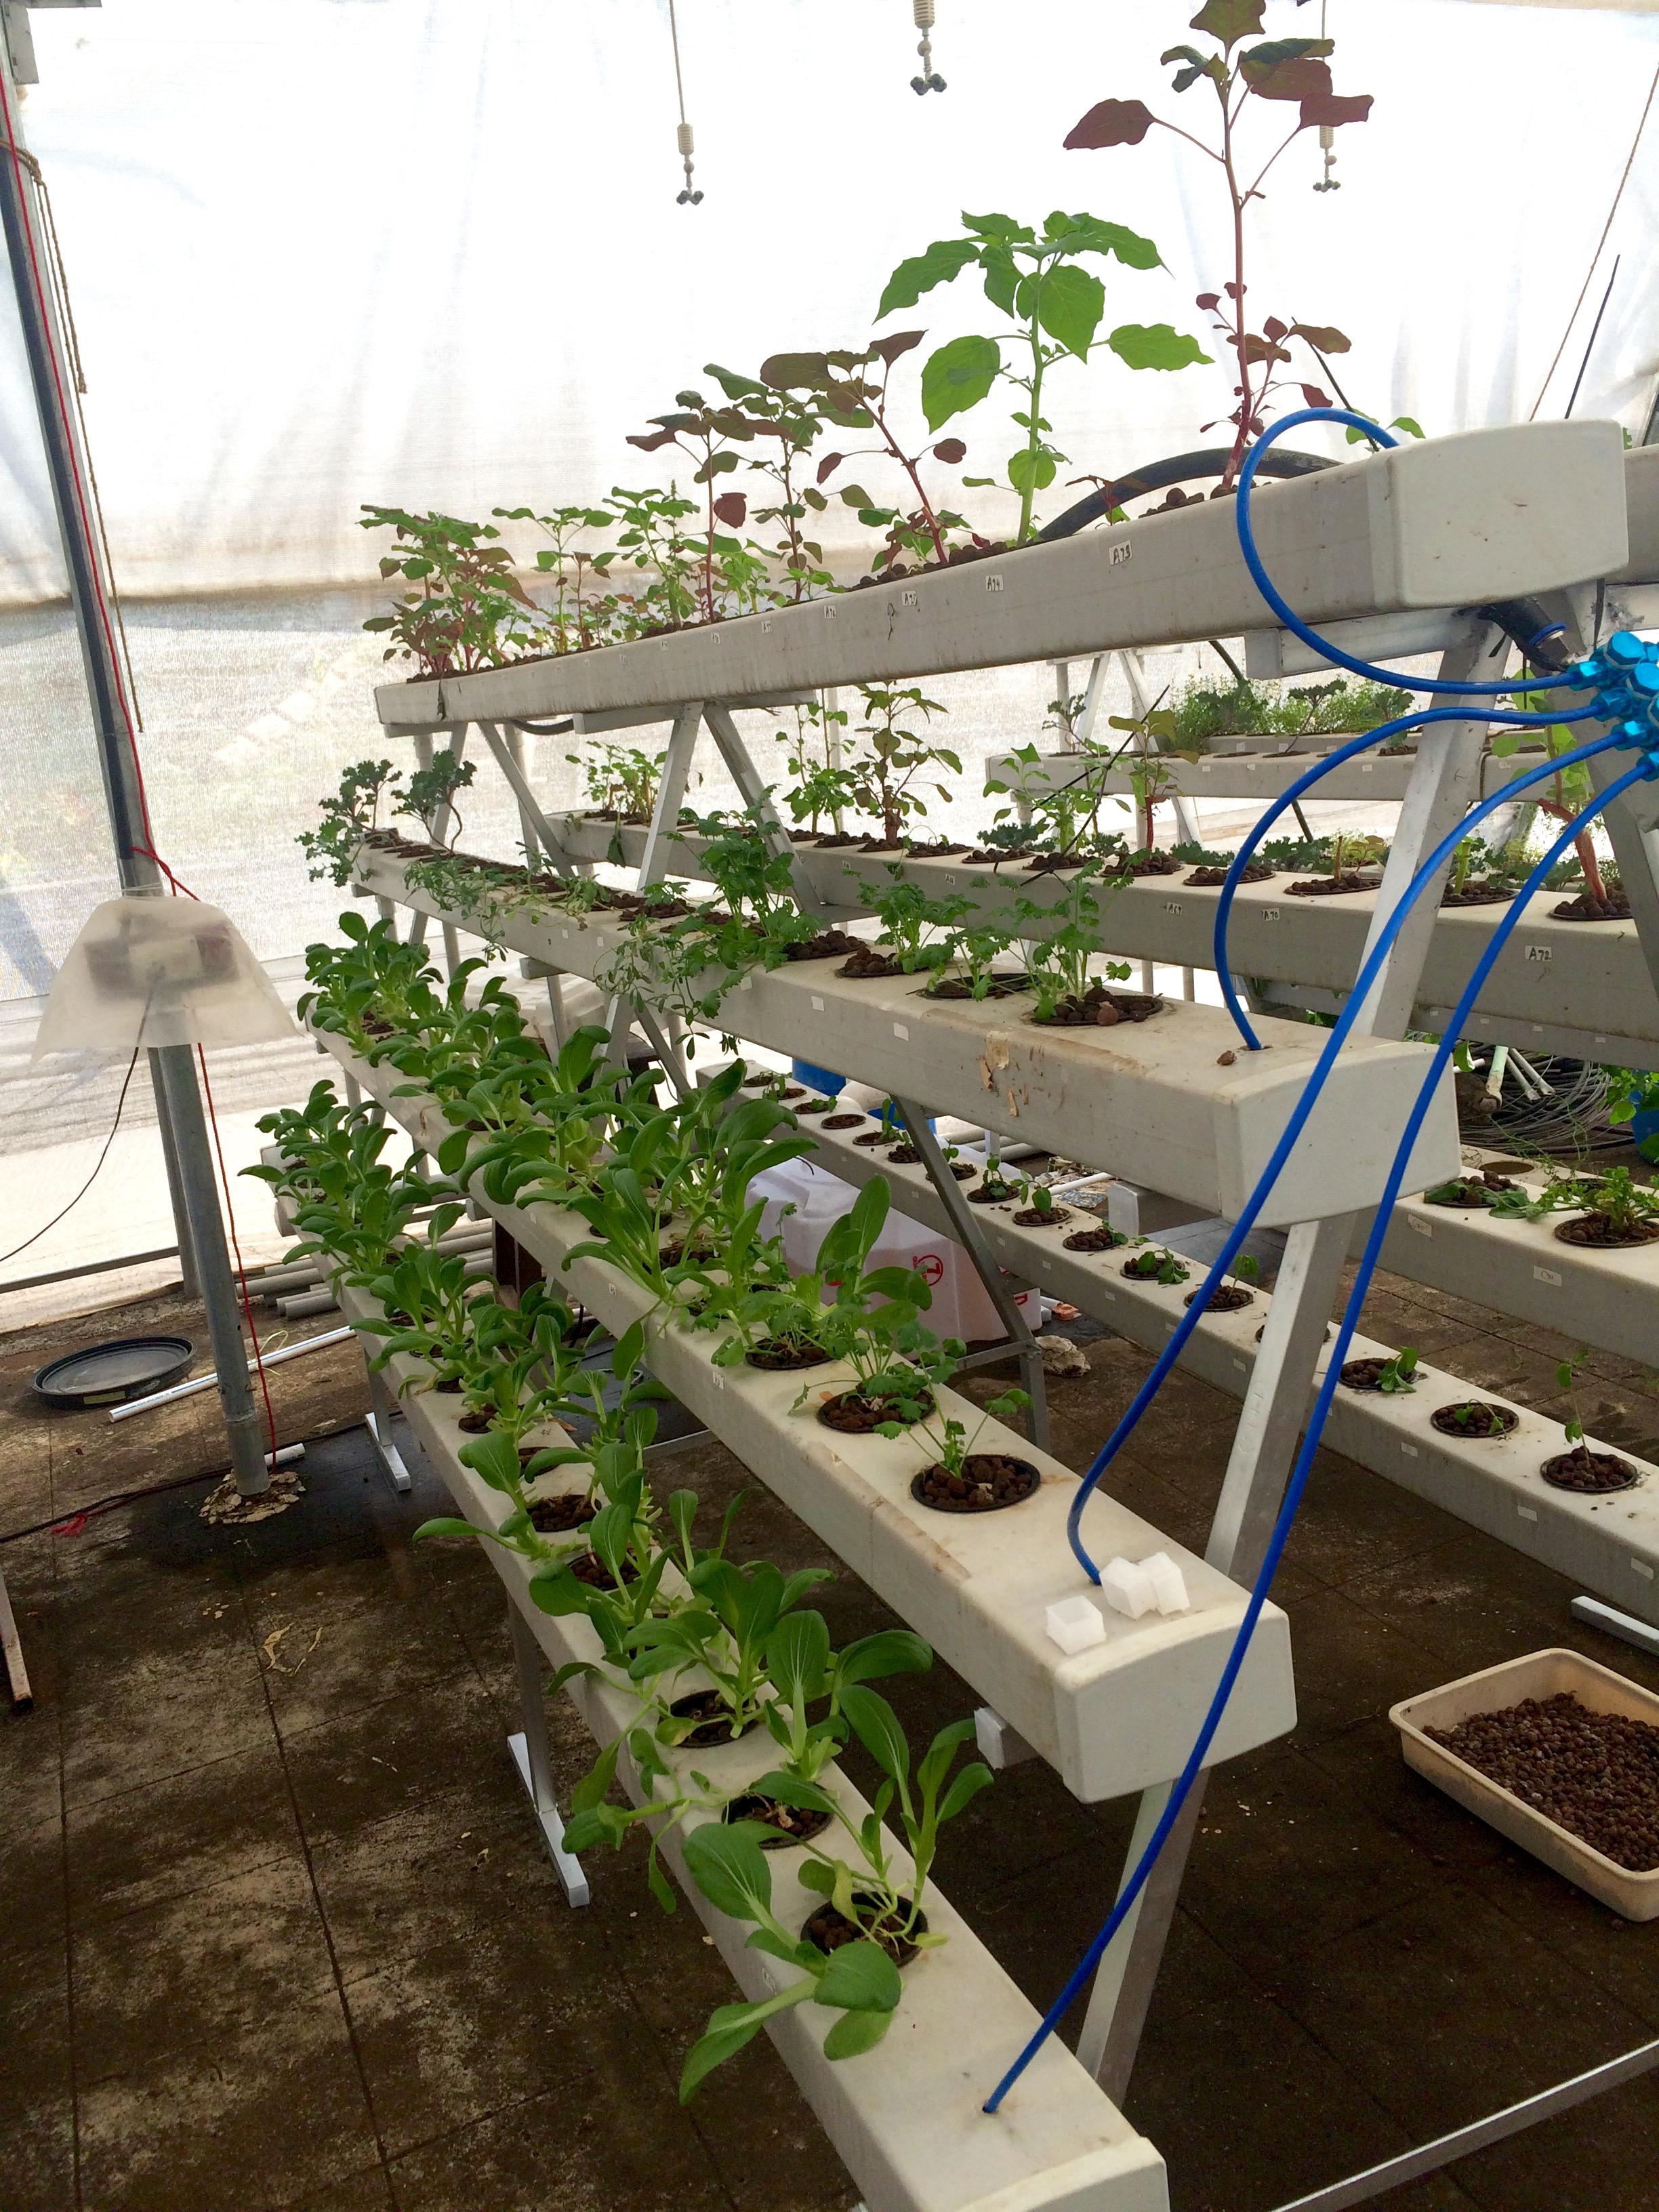 Craft promotes aquaponics and hydroponics for urban for Hydroponics aquaponics